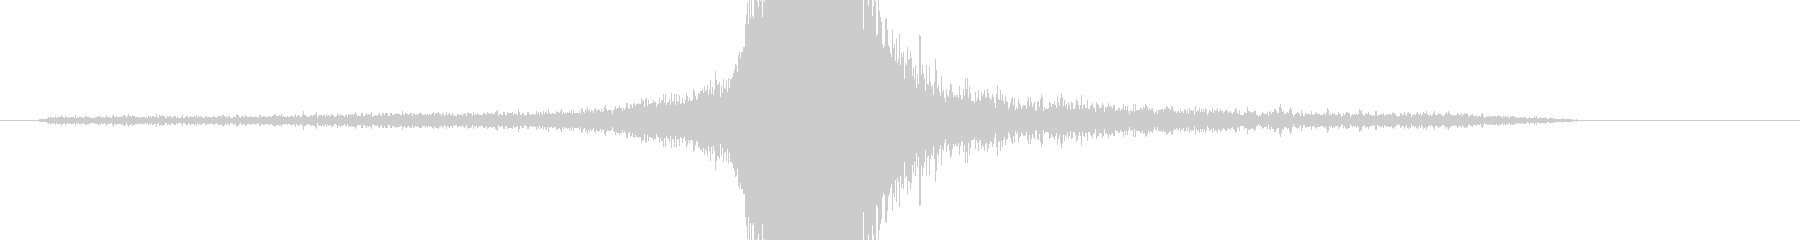 F-5:土地/オーバーヘッド;ラン...の未再生の波形